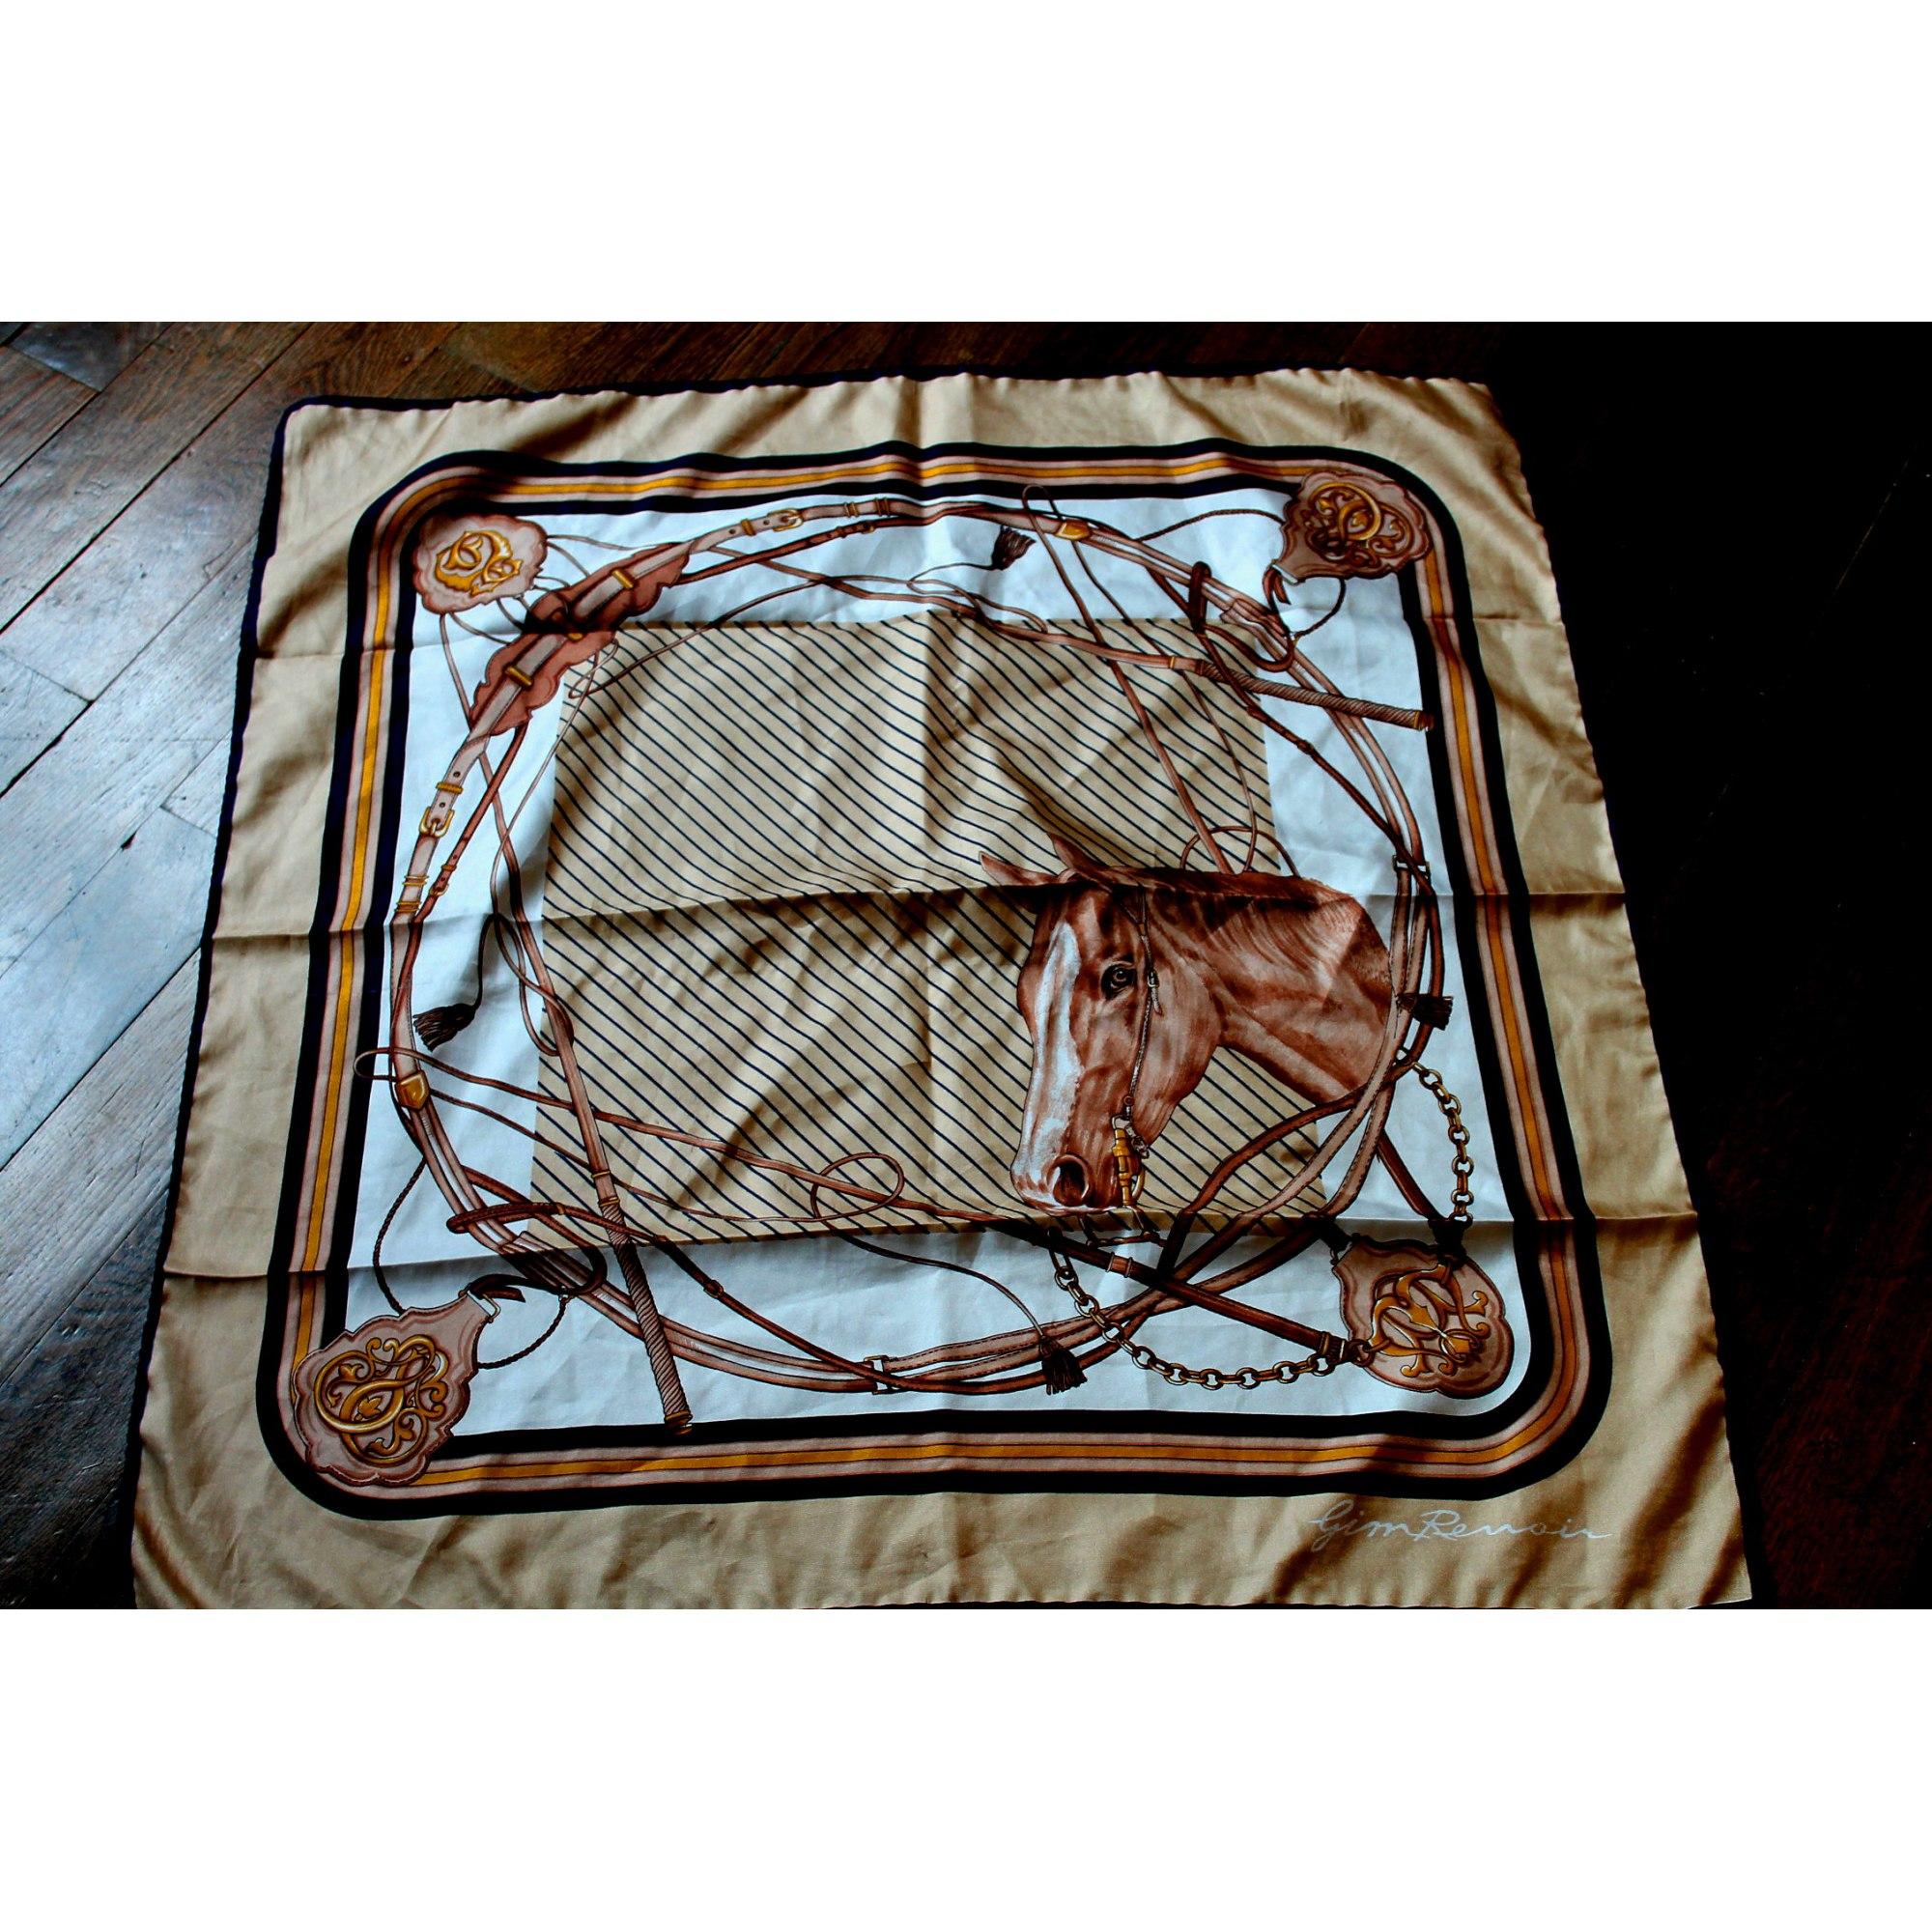 Foulard GYM RENOIR motifs équitation - 1739868 2c77e4ec005